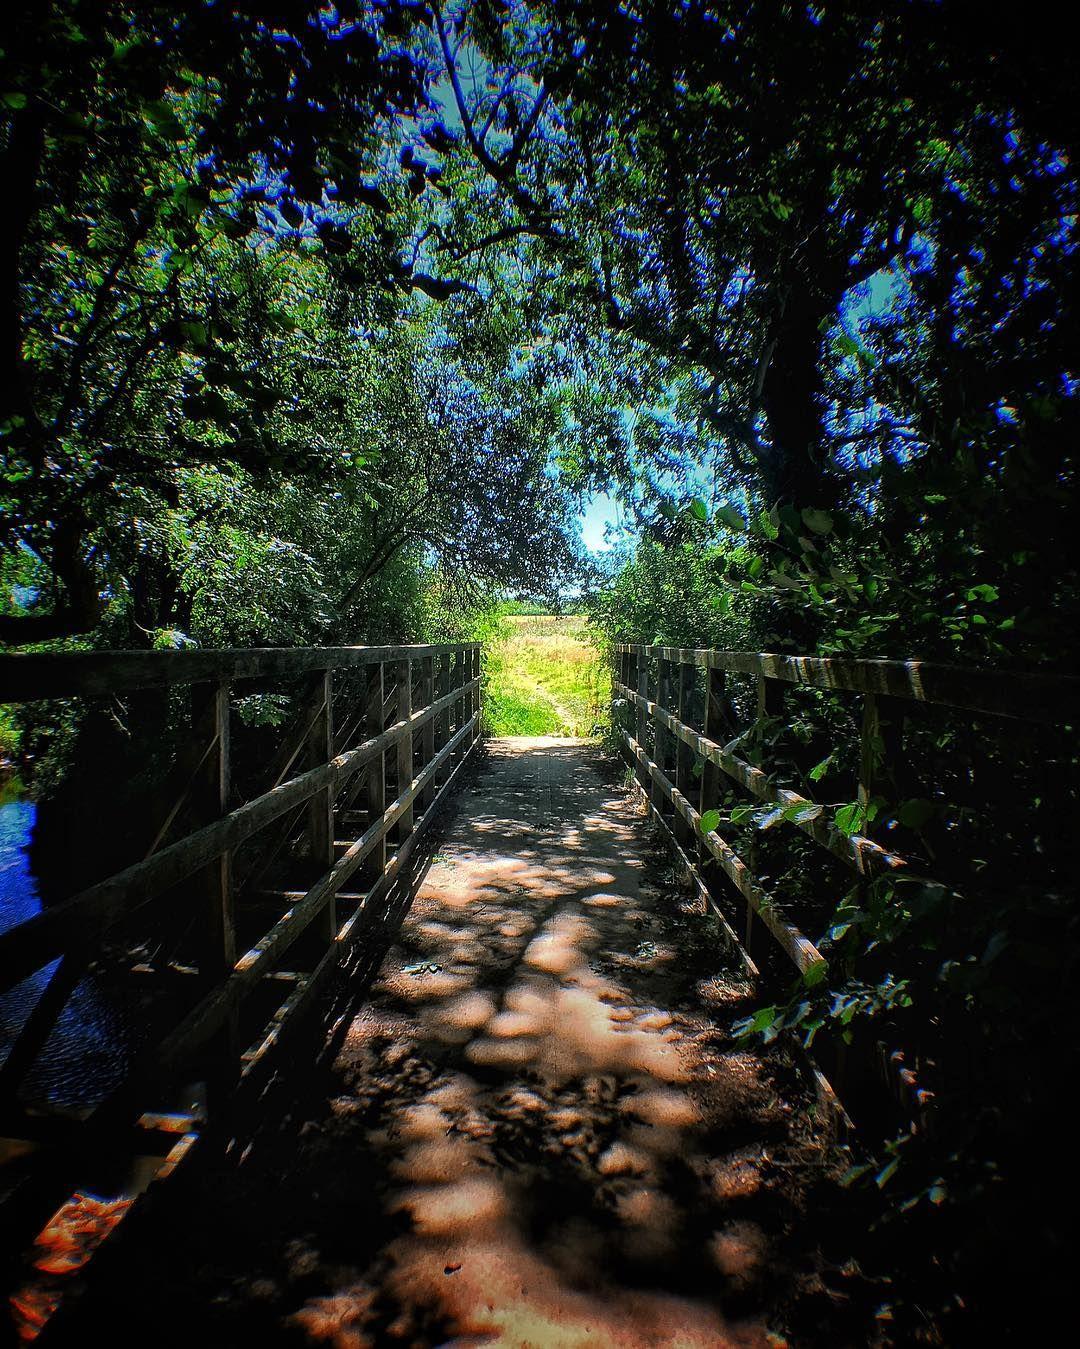 The Bridge Bridge Shadows Sun Light Dappledlight Trees Landscape Perspective Leadinglines Nature Olloclip Dappled Light Landscape Instagram Posts